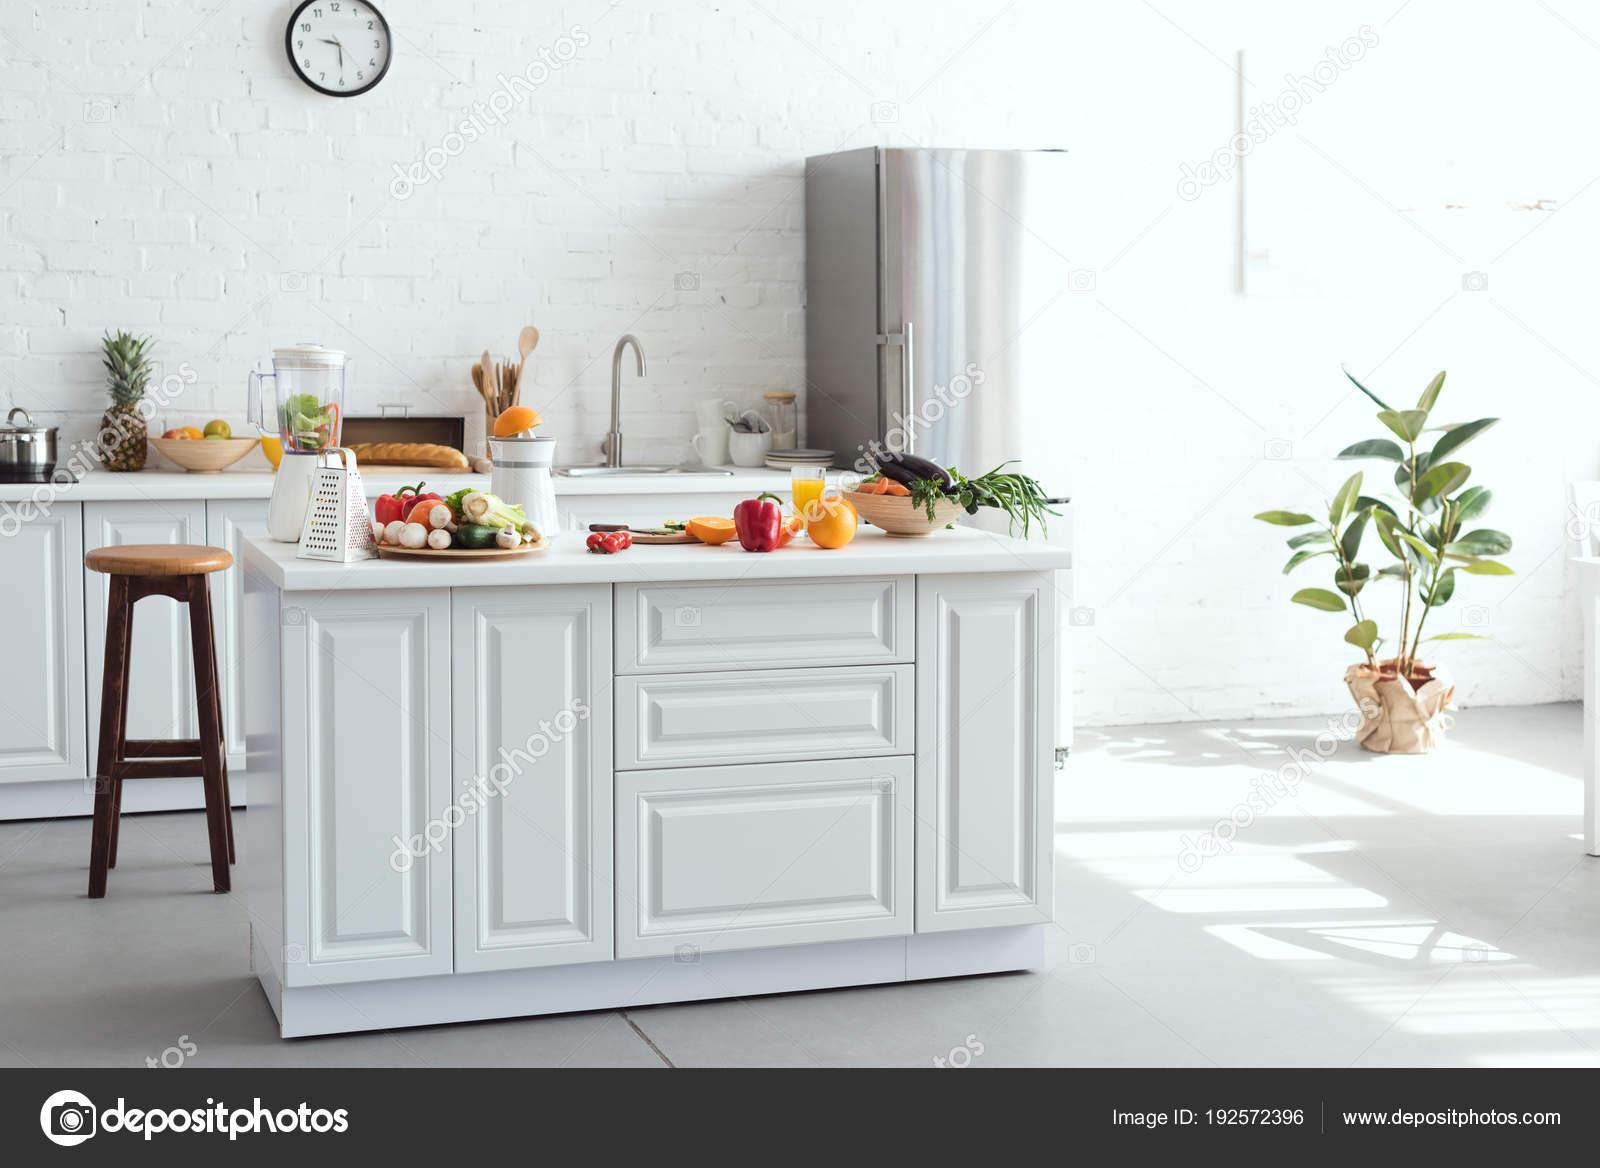 kitchen counter yellow table 厨房柜台上的水果蔬菜白光厨房内饰 图库照片 c vitalikradko 192572396